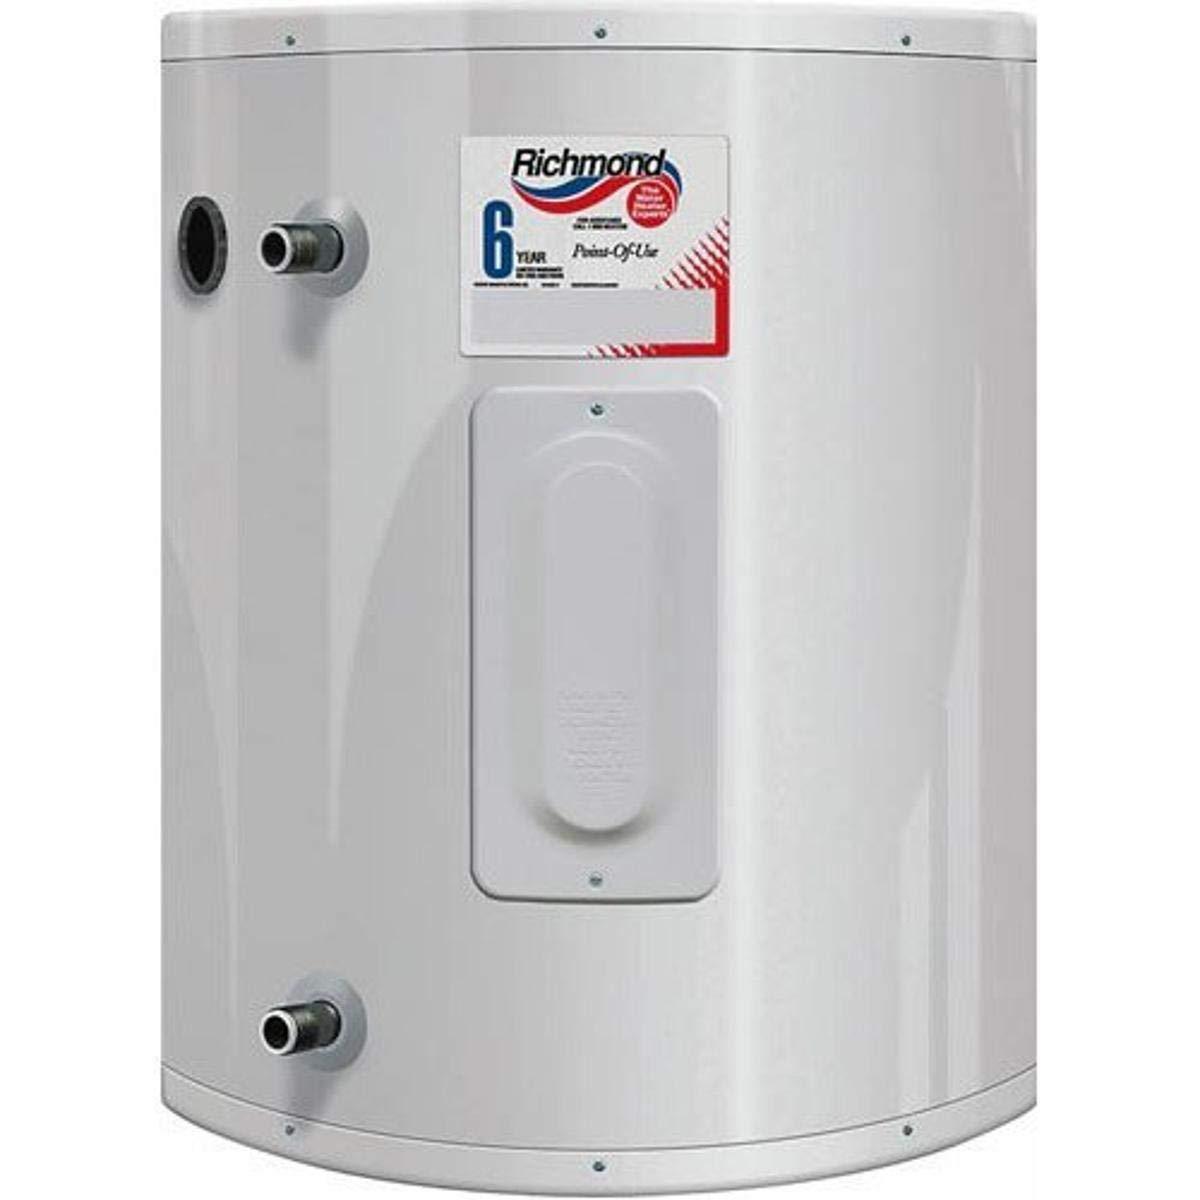 Rheem Richmond 6ep20 1 2000 W 120 Vac Tank Richmond Electric Water Heater 20 Gal 20 Gallon Water Heaters Amazon Com